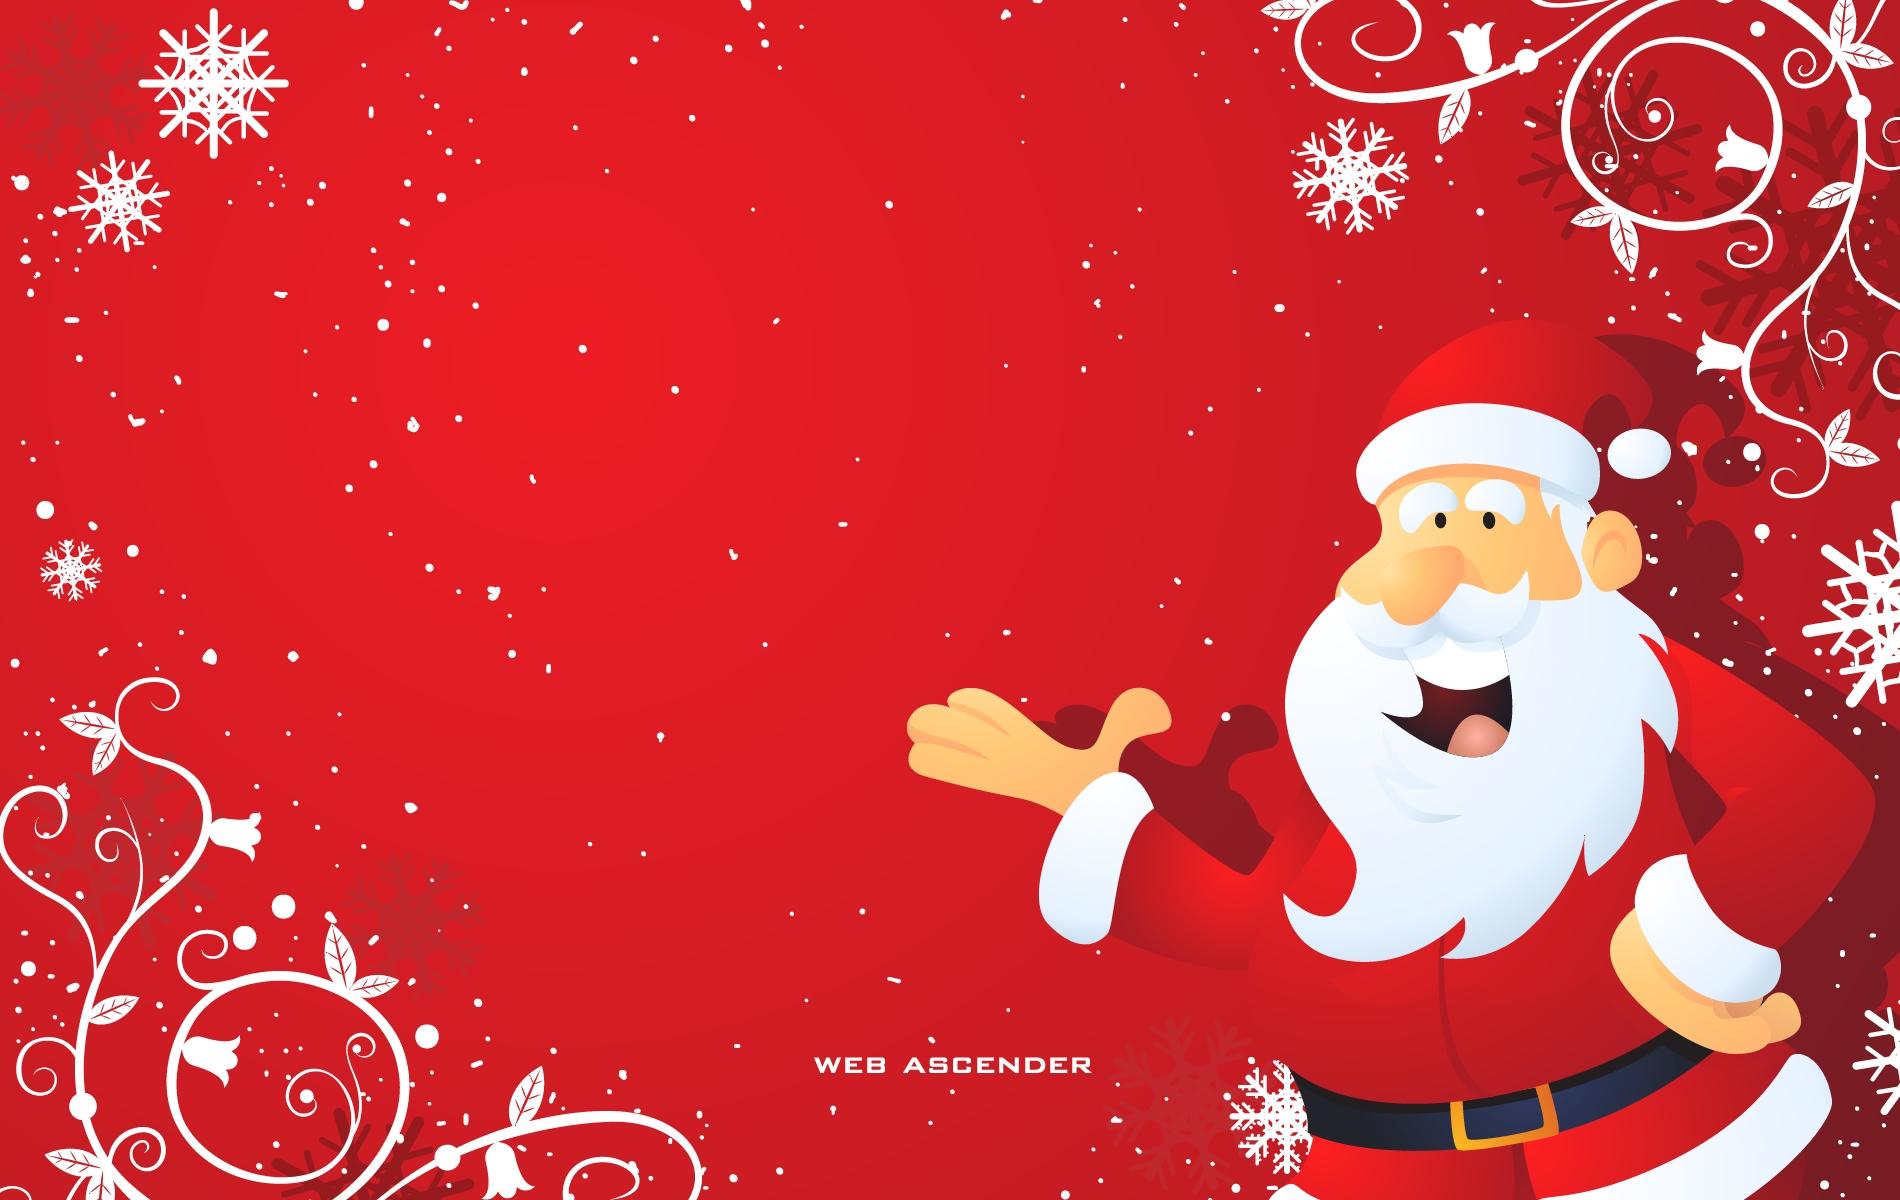 75 Santa Claus Backgrounds On Wallpapersafari